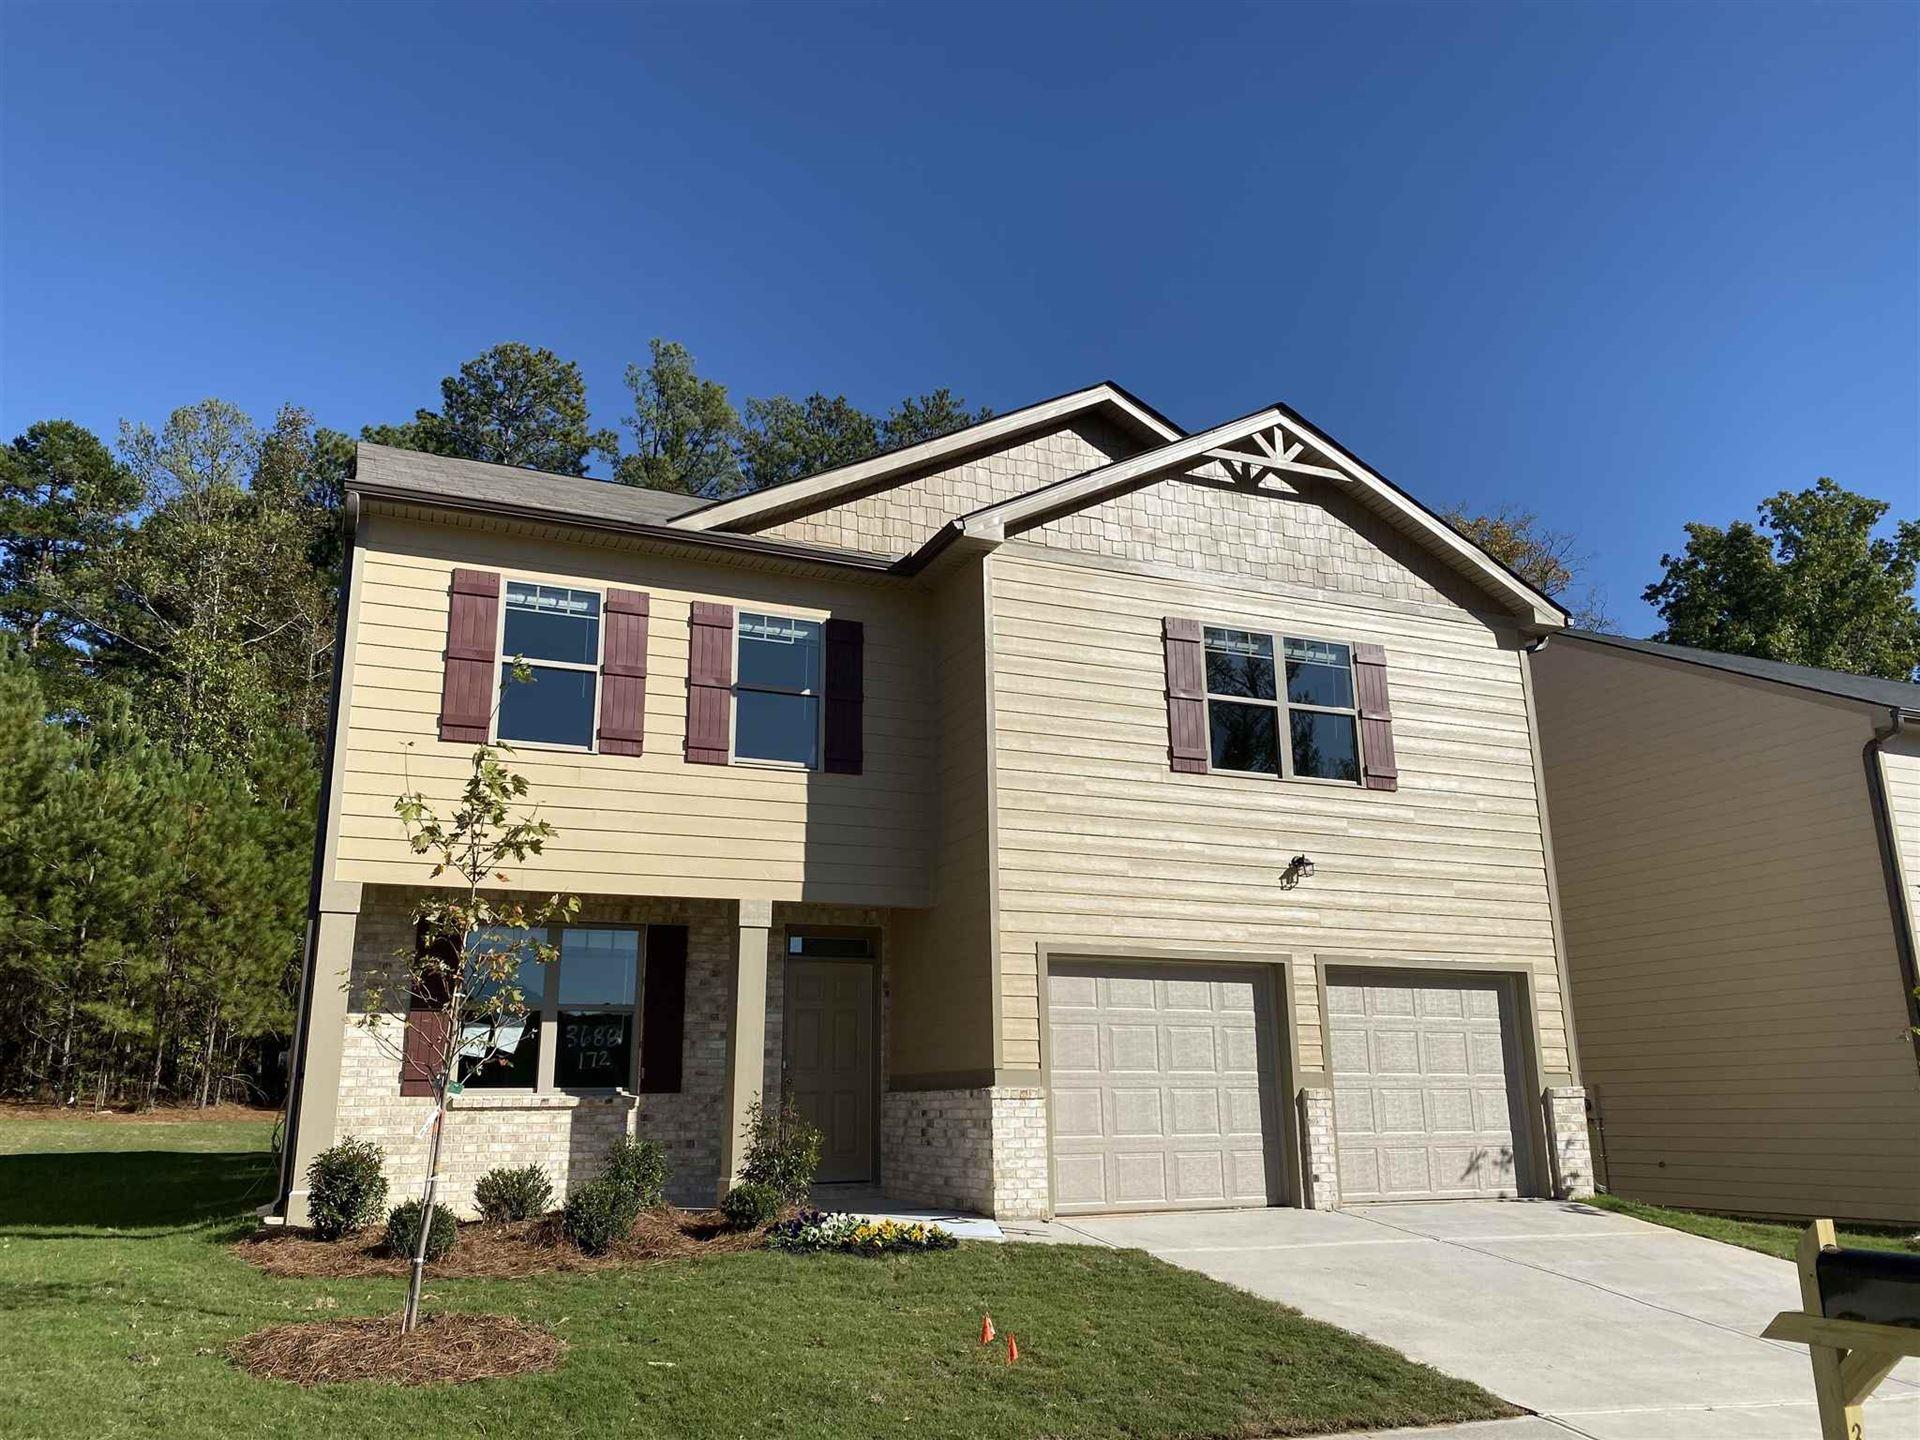 3717 River Rock Rd, Lithonia, GA 30038 - MLS#: 8864385